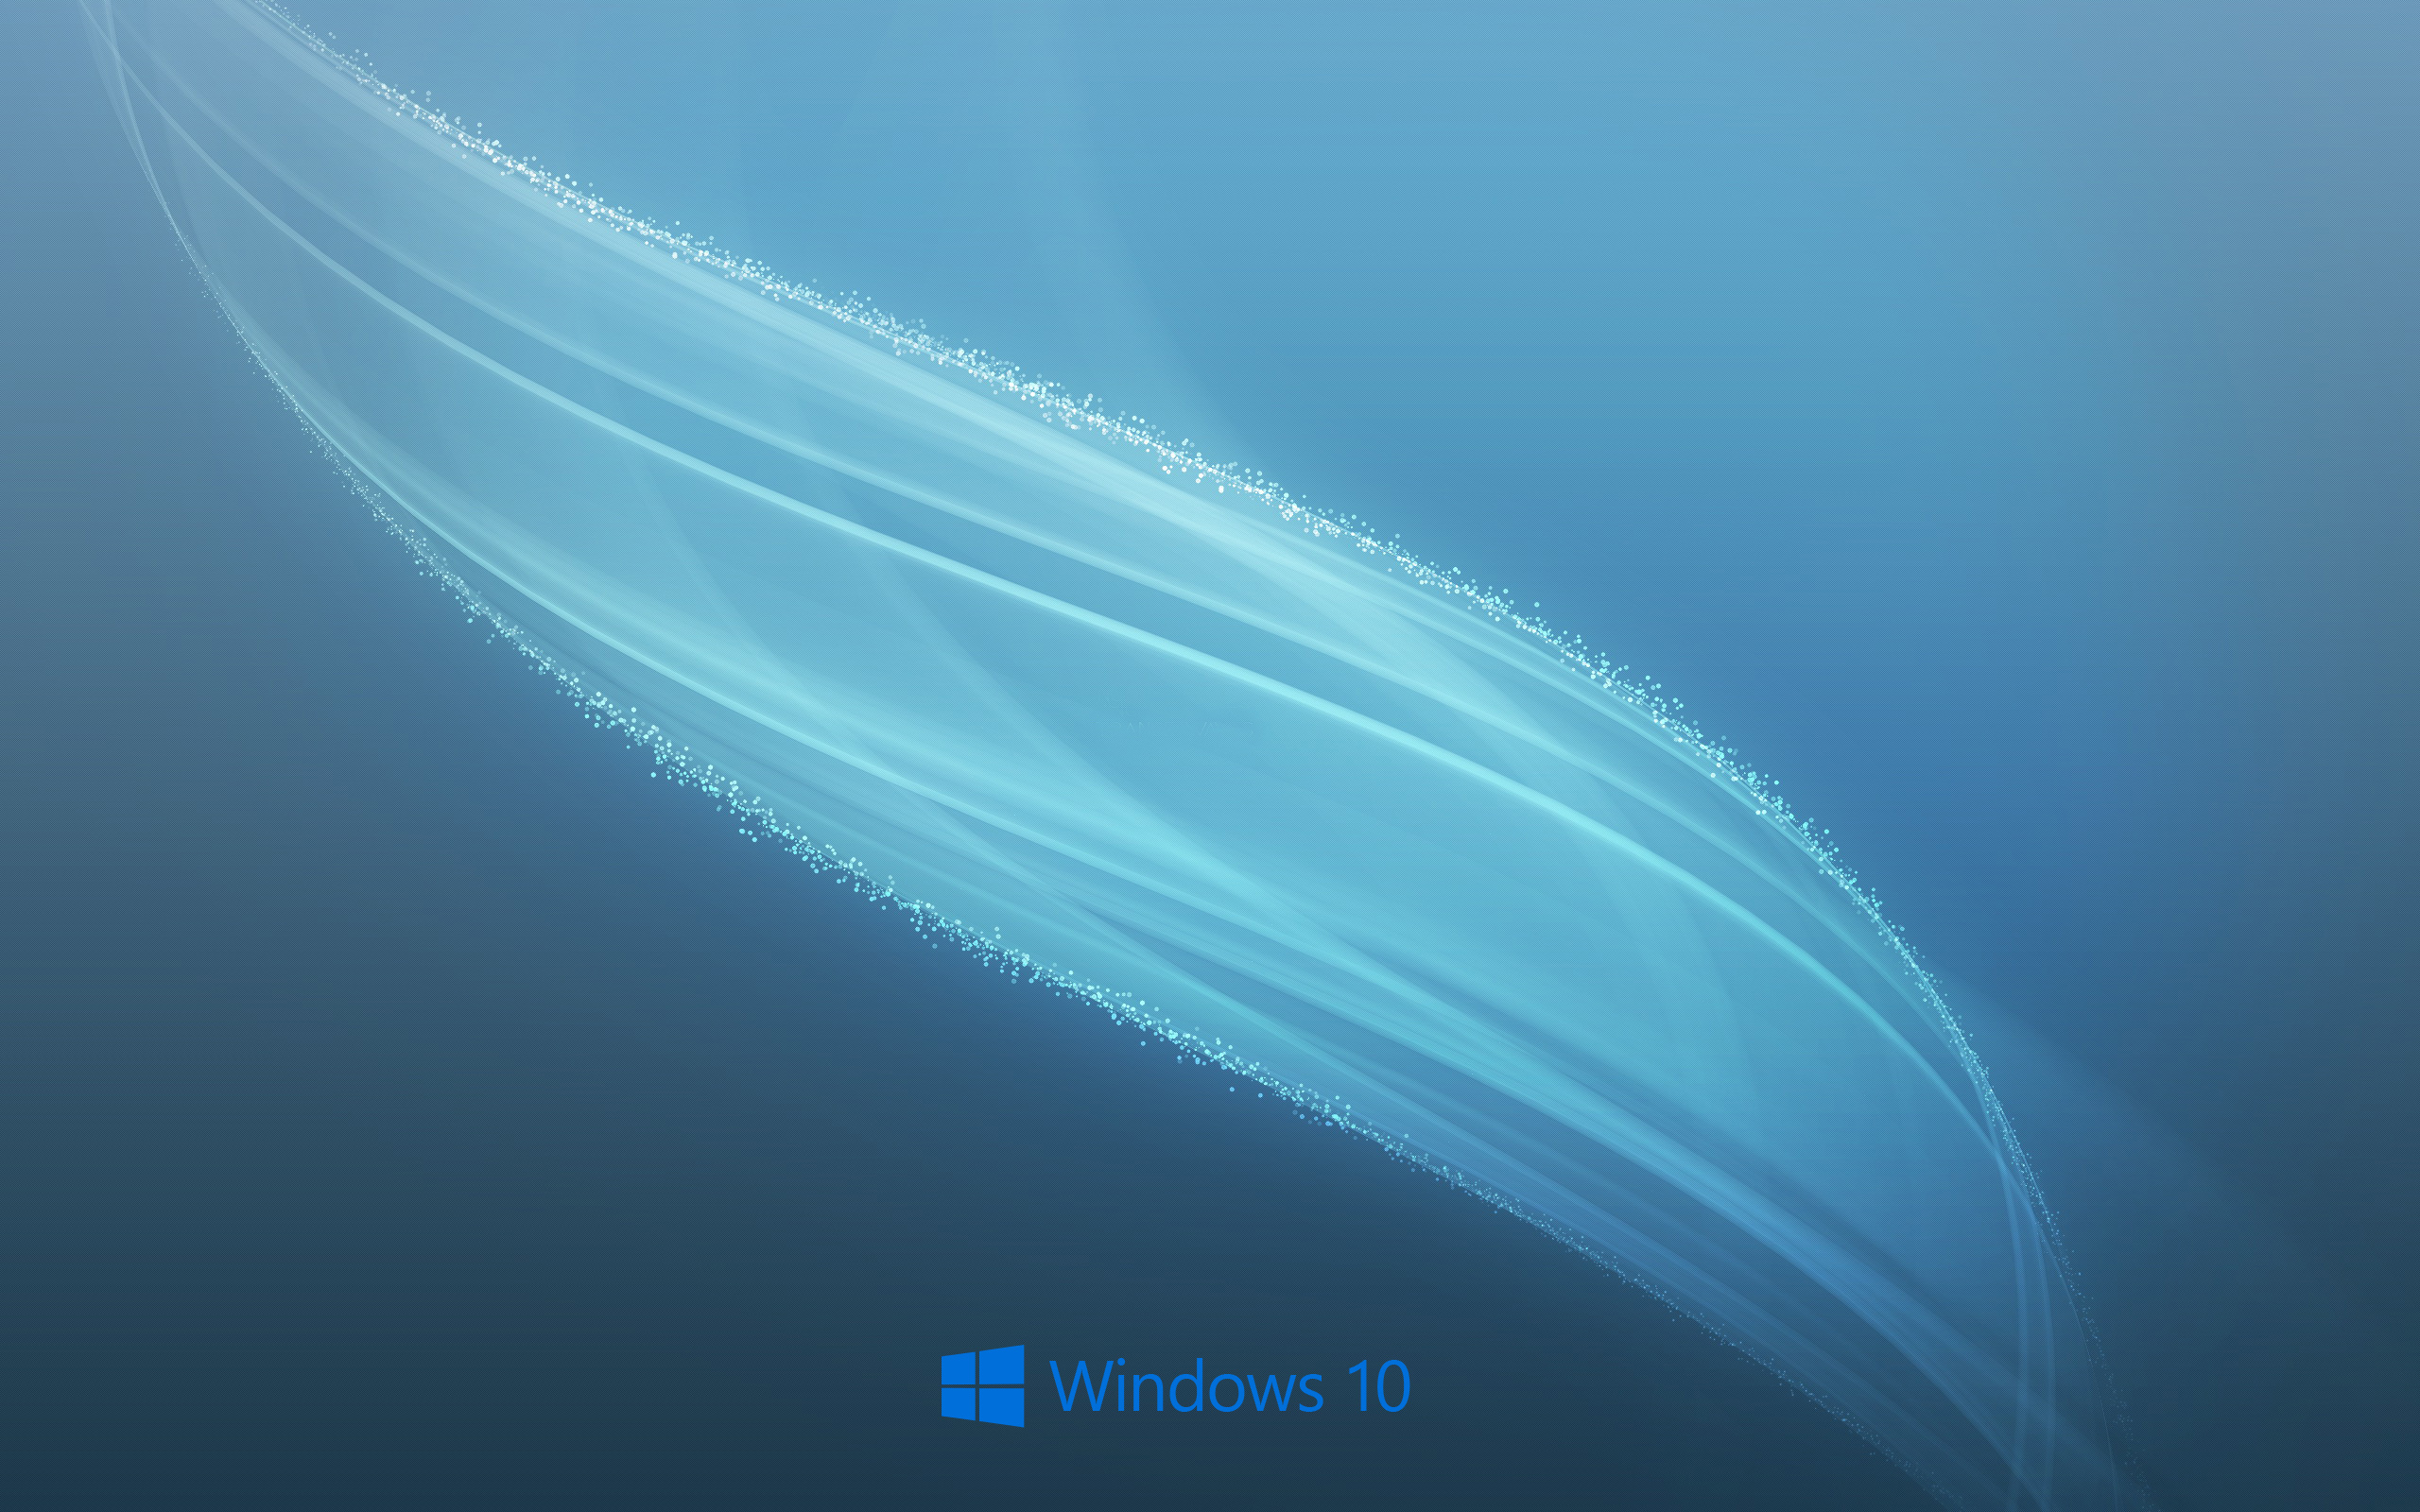 Windows 10 Wallpaper Light